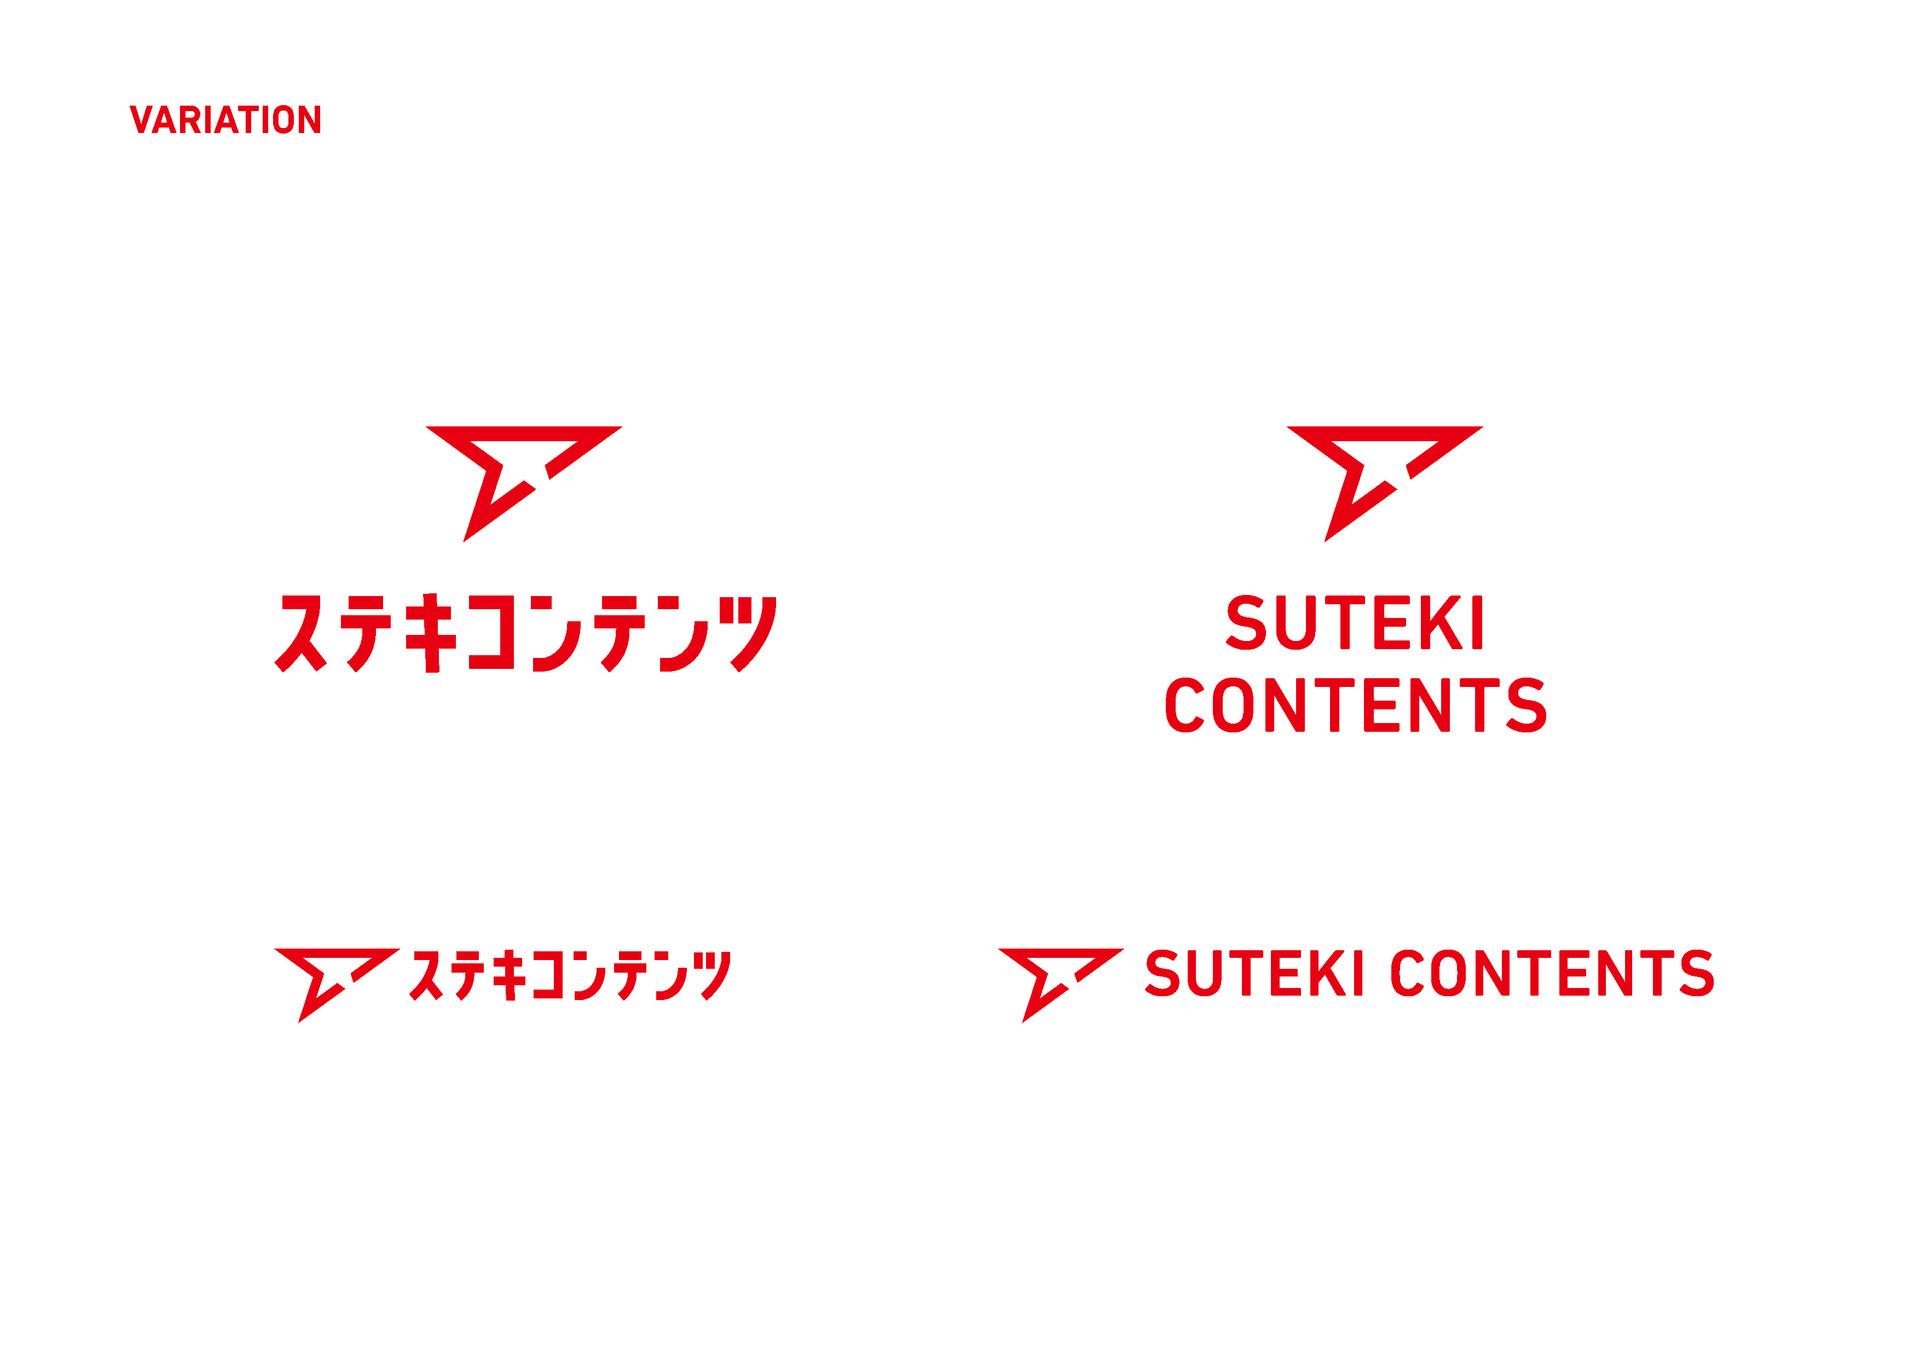 suteki_logo_6.jpg